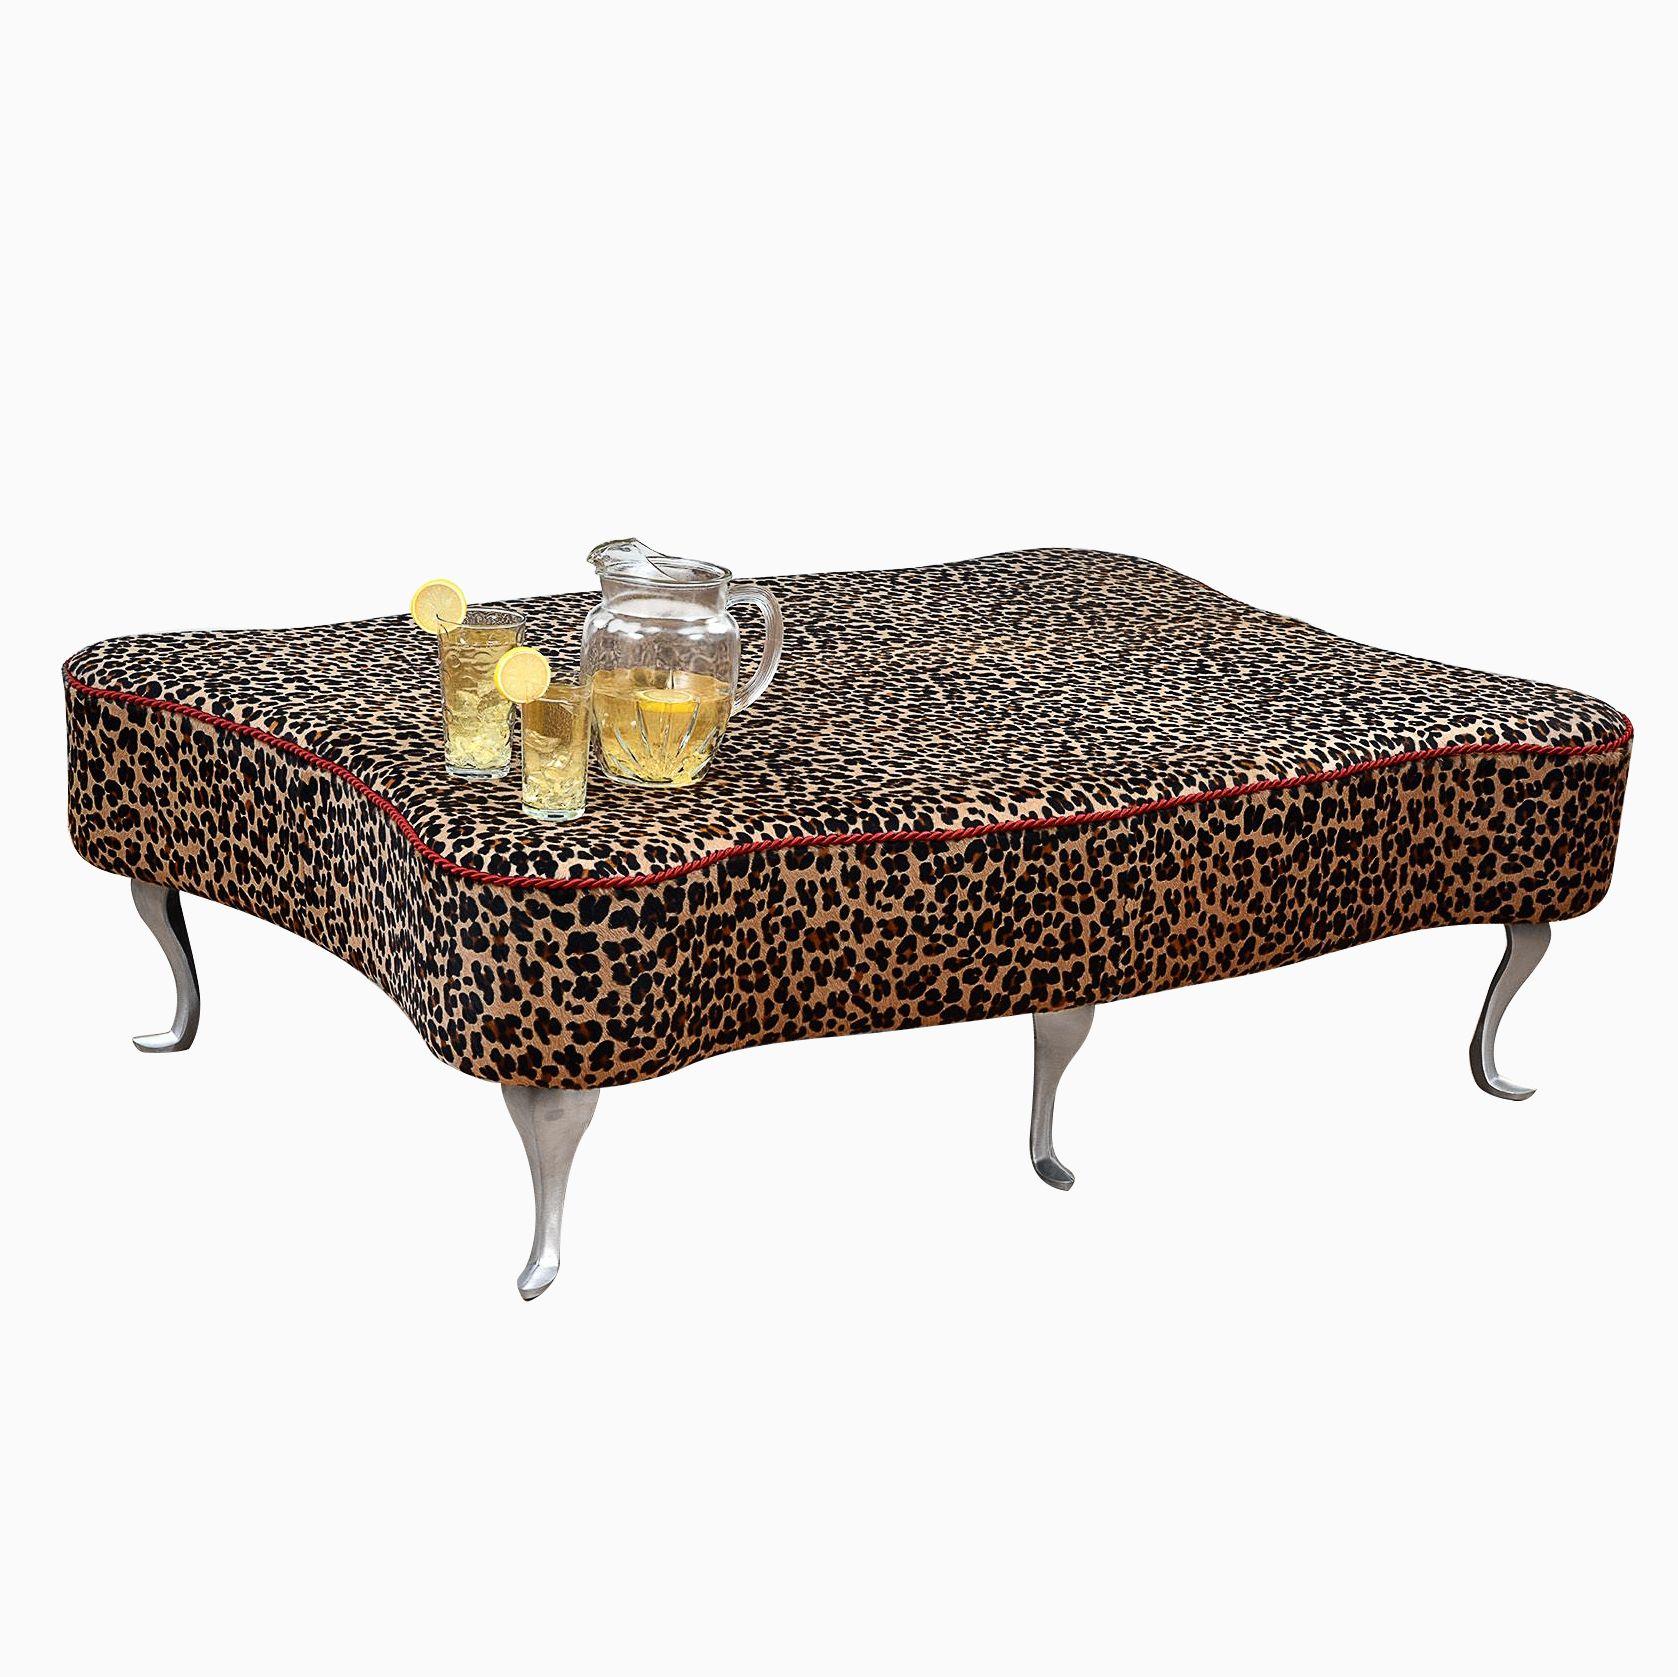 Custom Made Leopard Leather Hair On Hide Ottoman Coffee Table